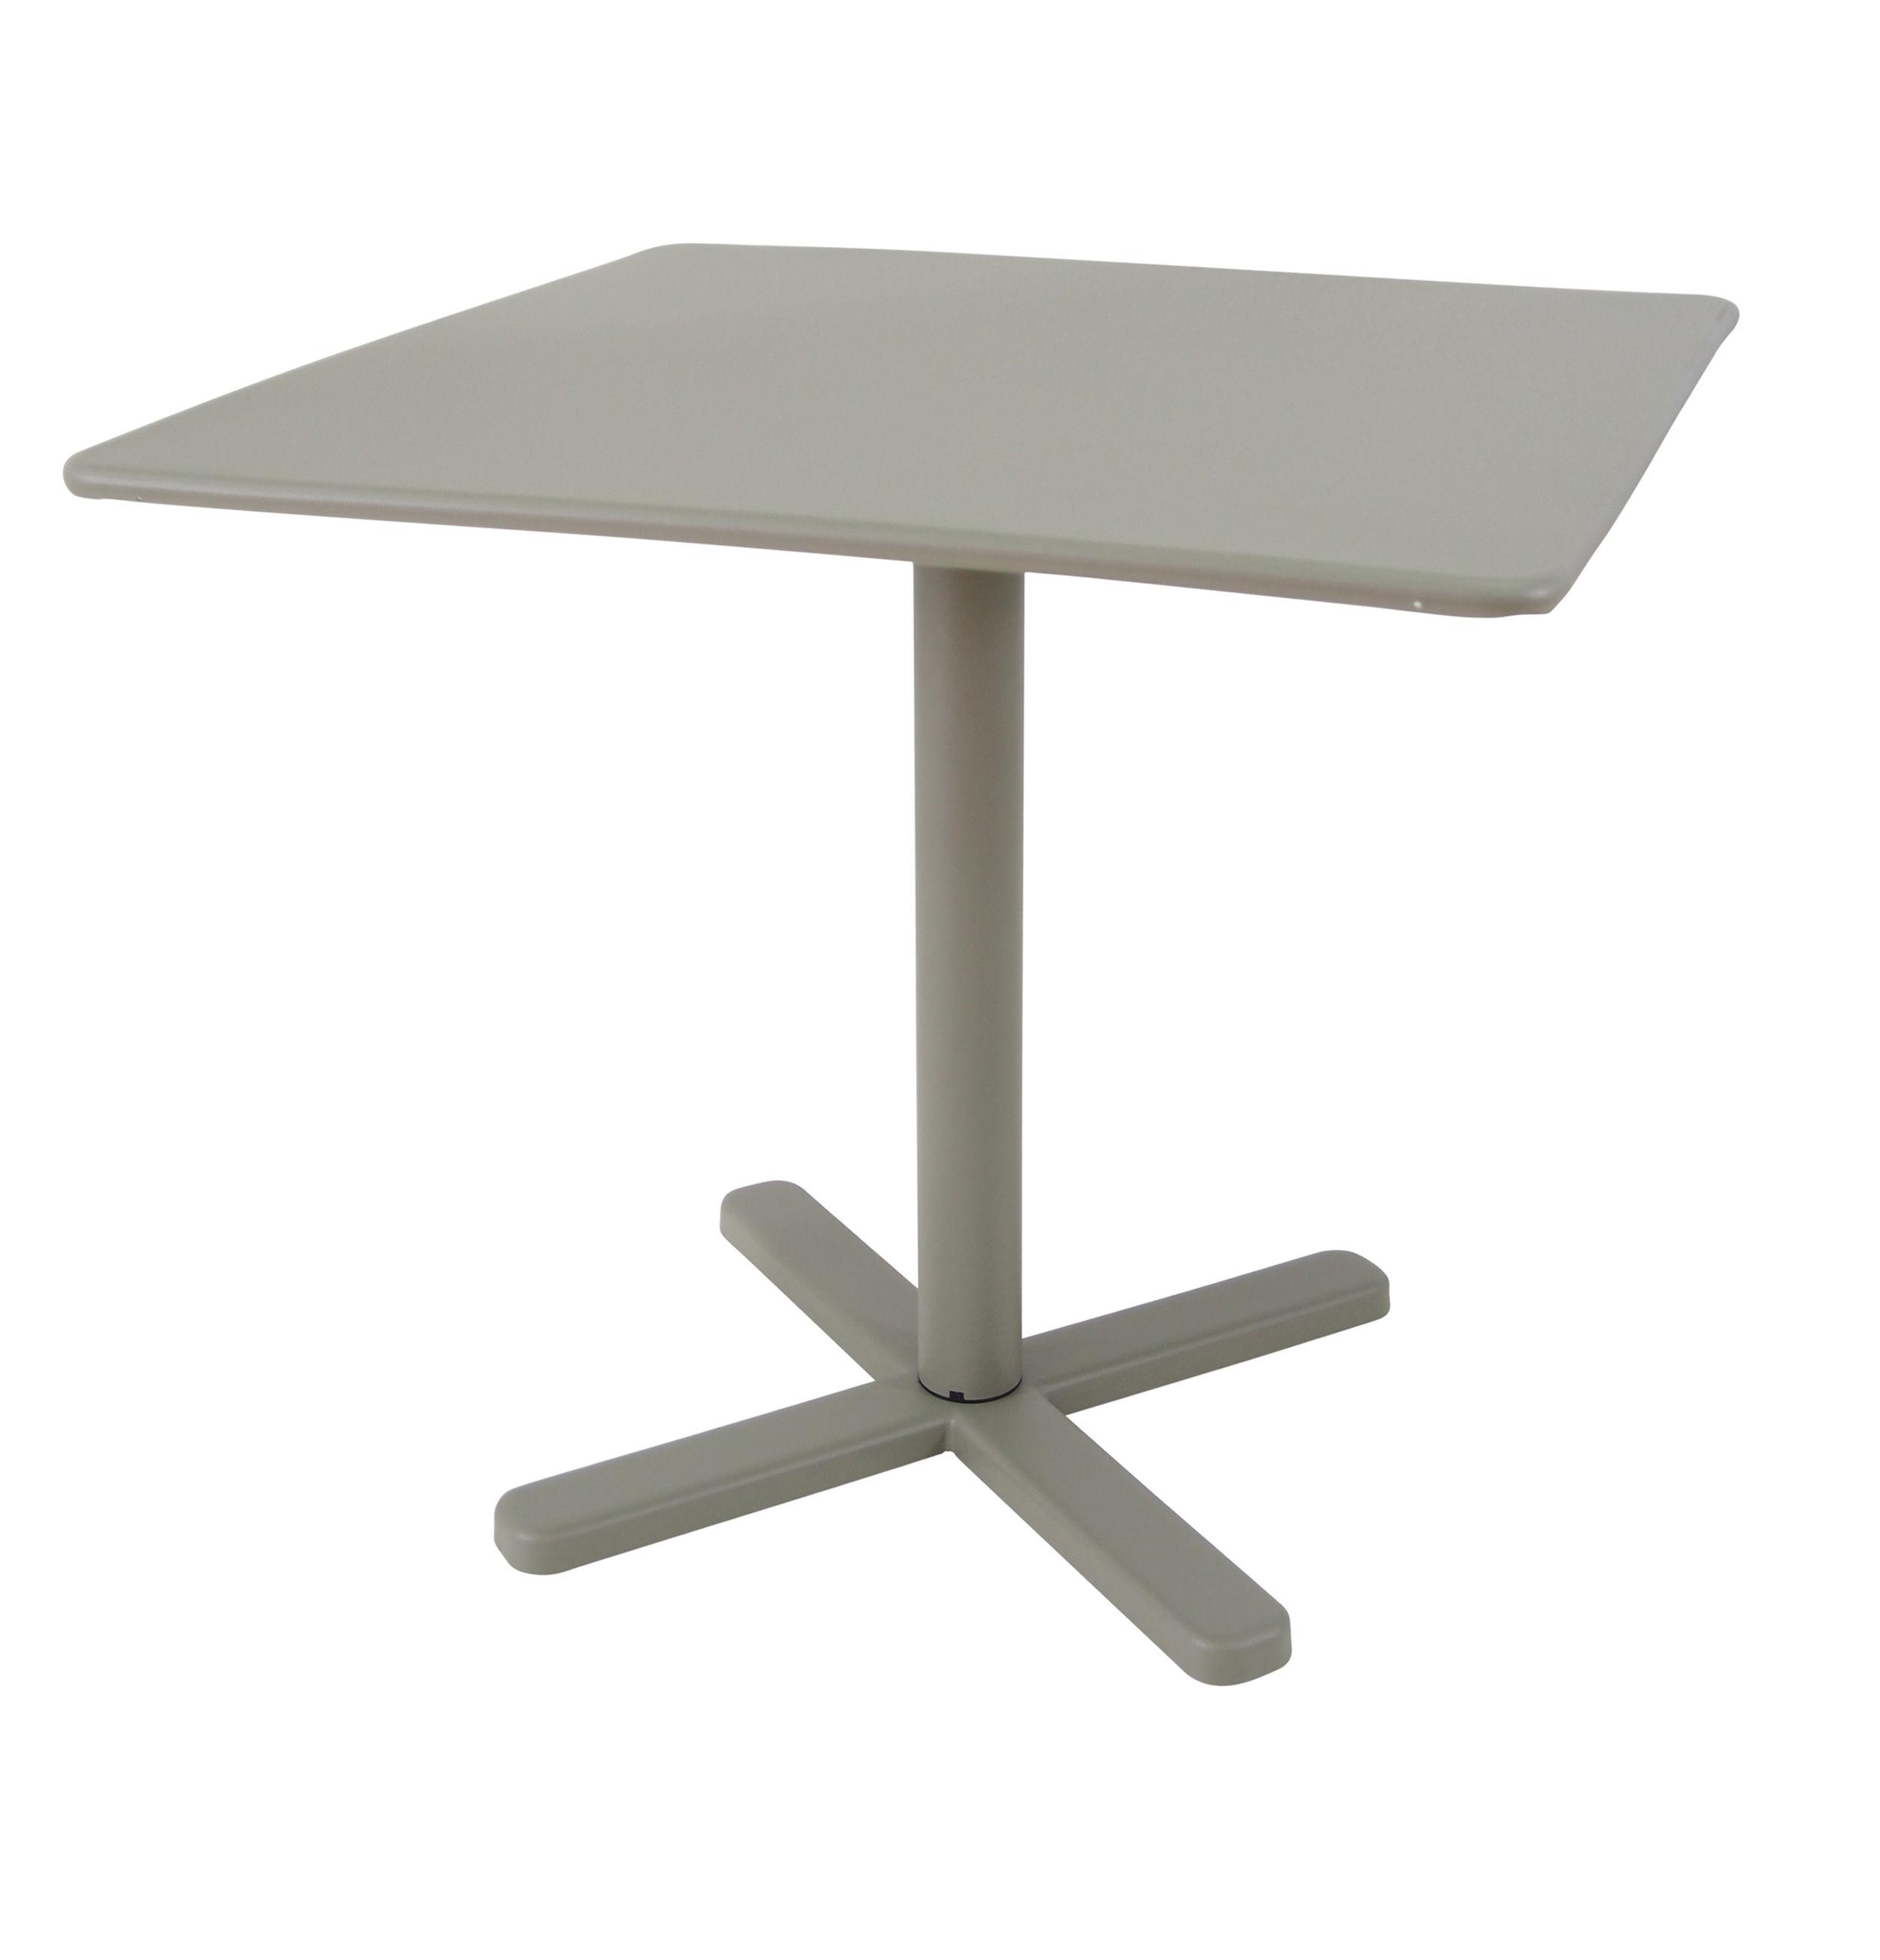 Darwin coffee table 70 x 70 cm grey by emu for Coffee table 70 x 70